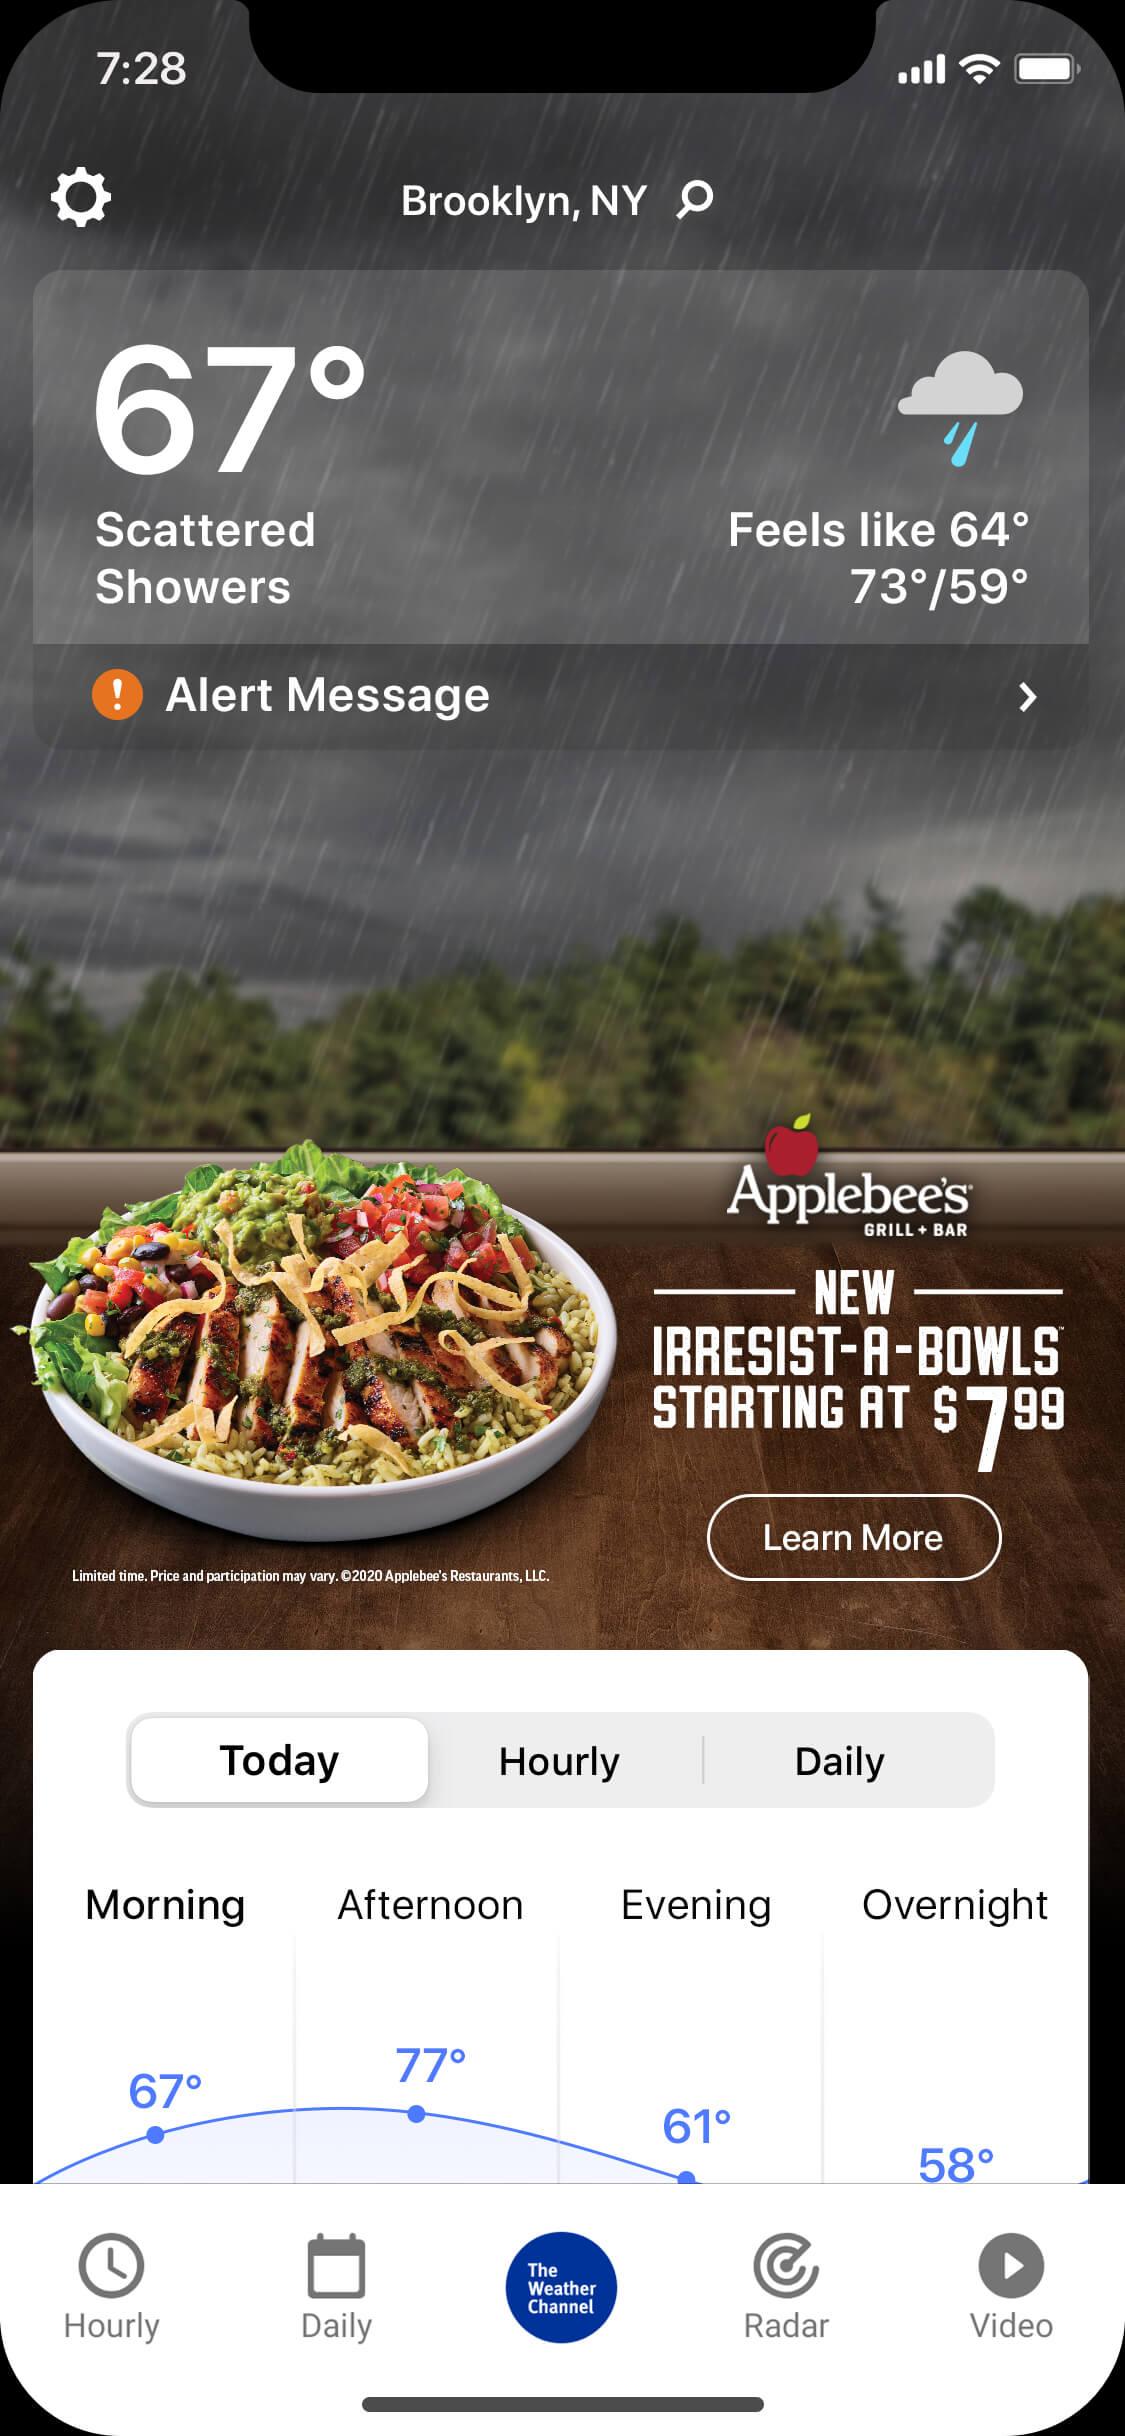 applebees-bowls-im_rainy-day